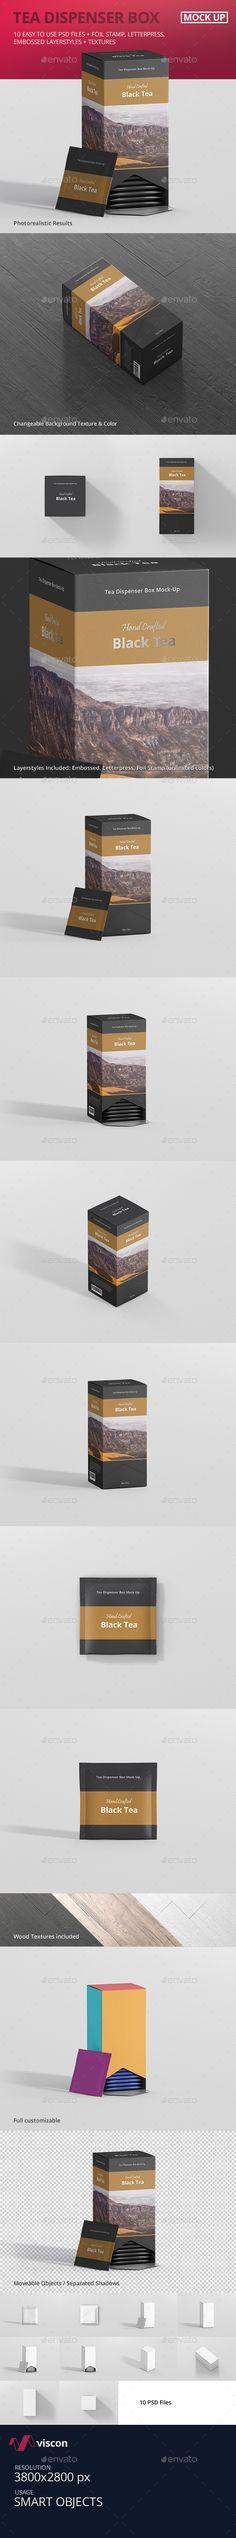 Tea Dispenser Box Mockup — Photoshop PSD #christmas #box mockup • Available here → https://graphicriver.net/item/tea-dispenser-box-mockup/18763140?ref=pxcr